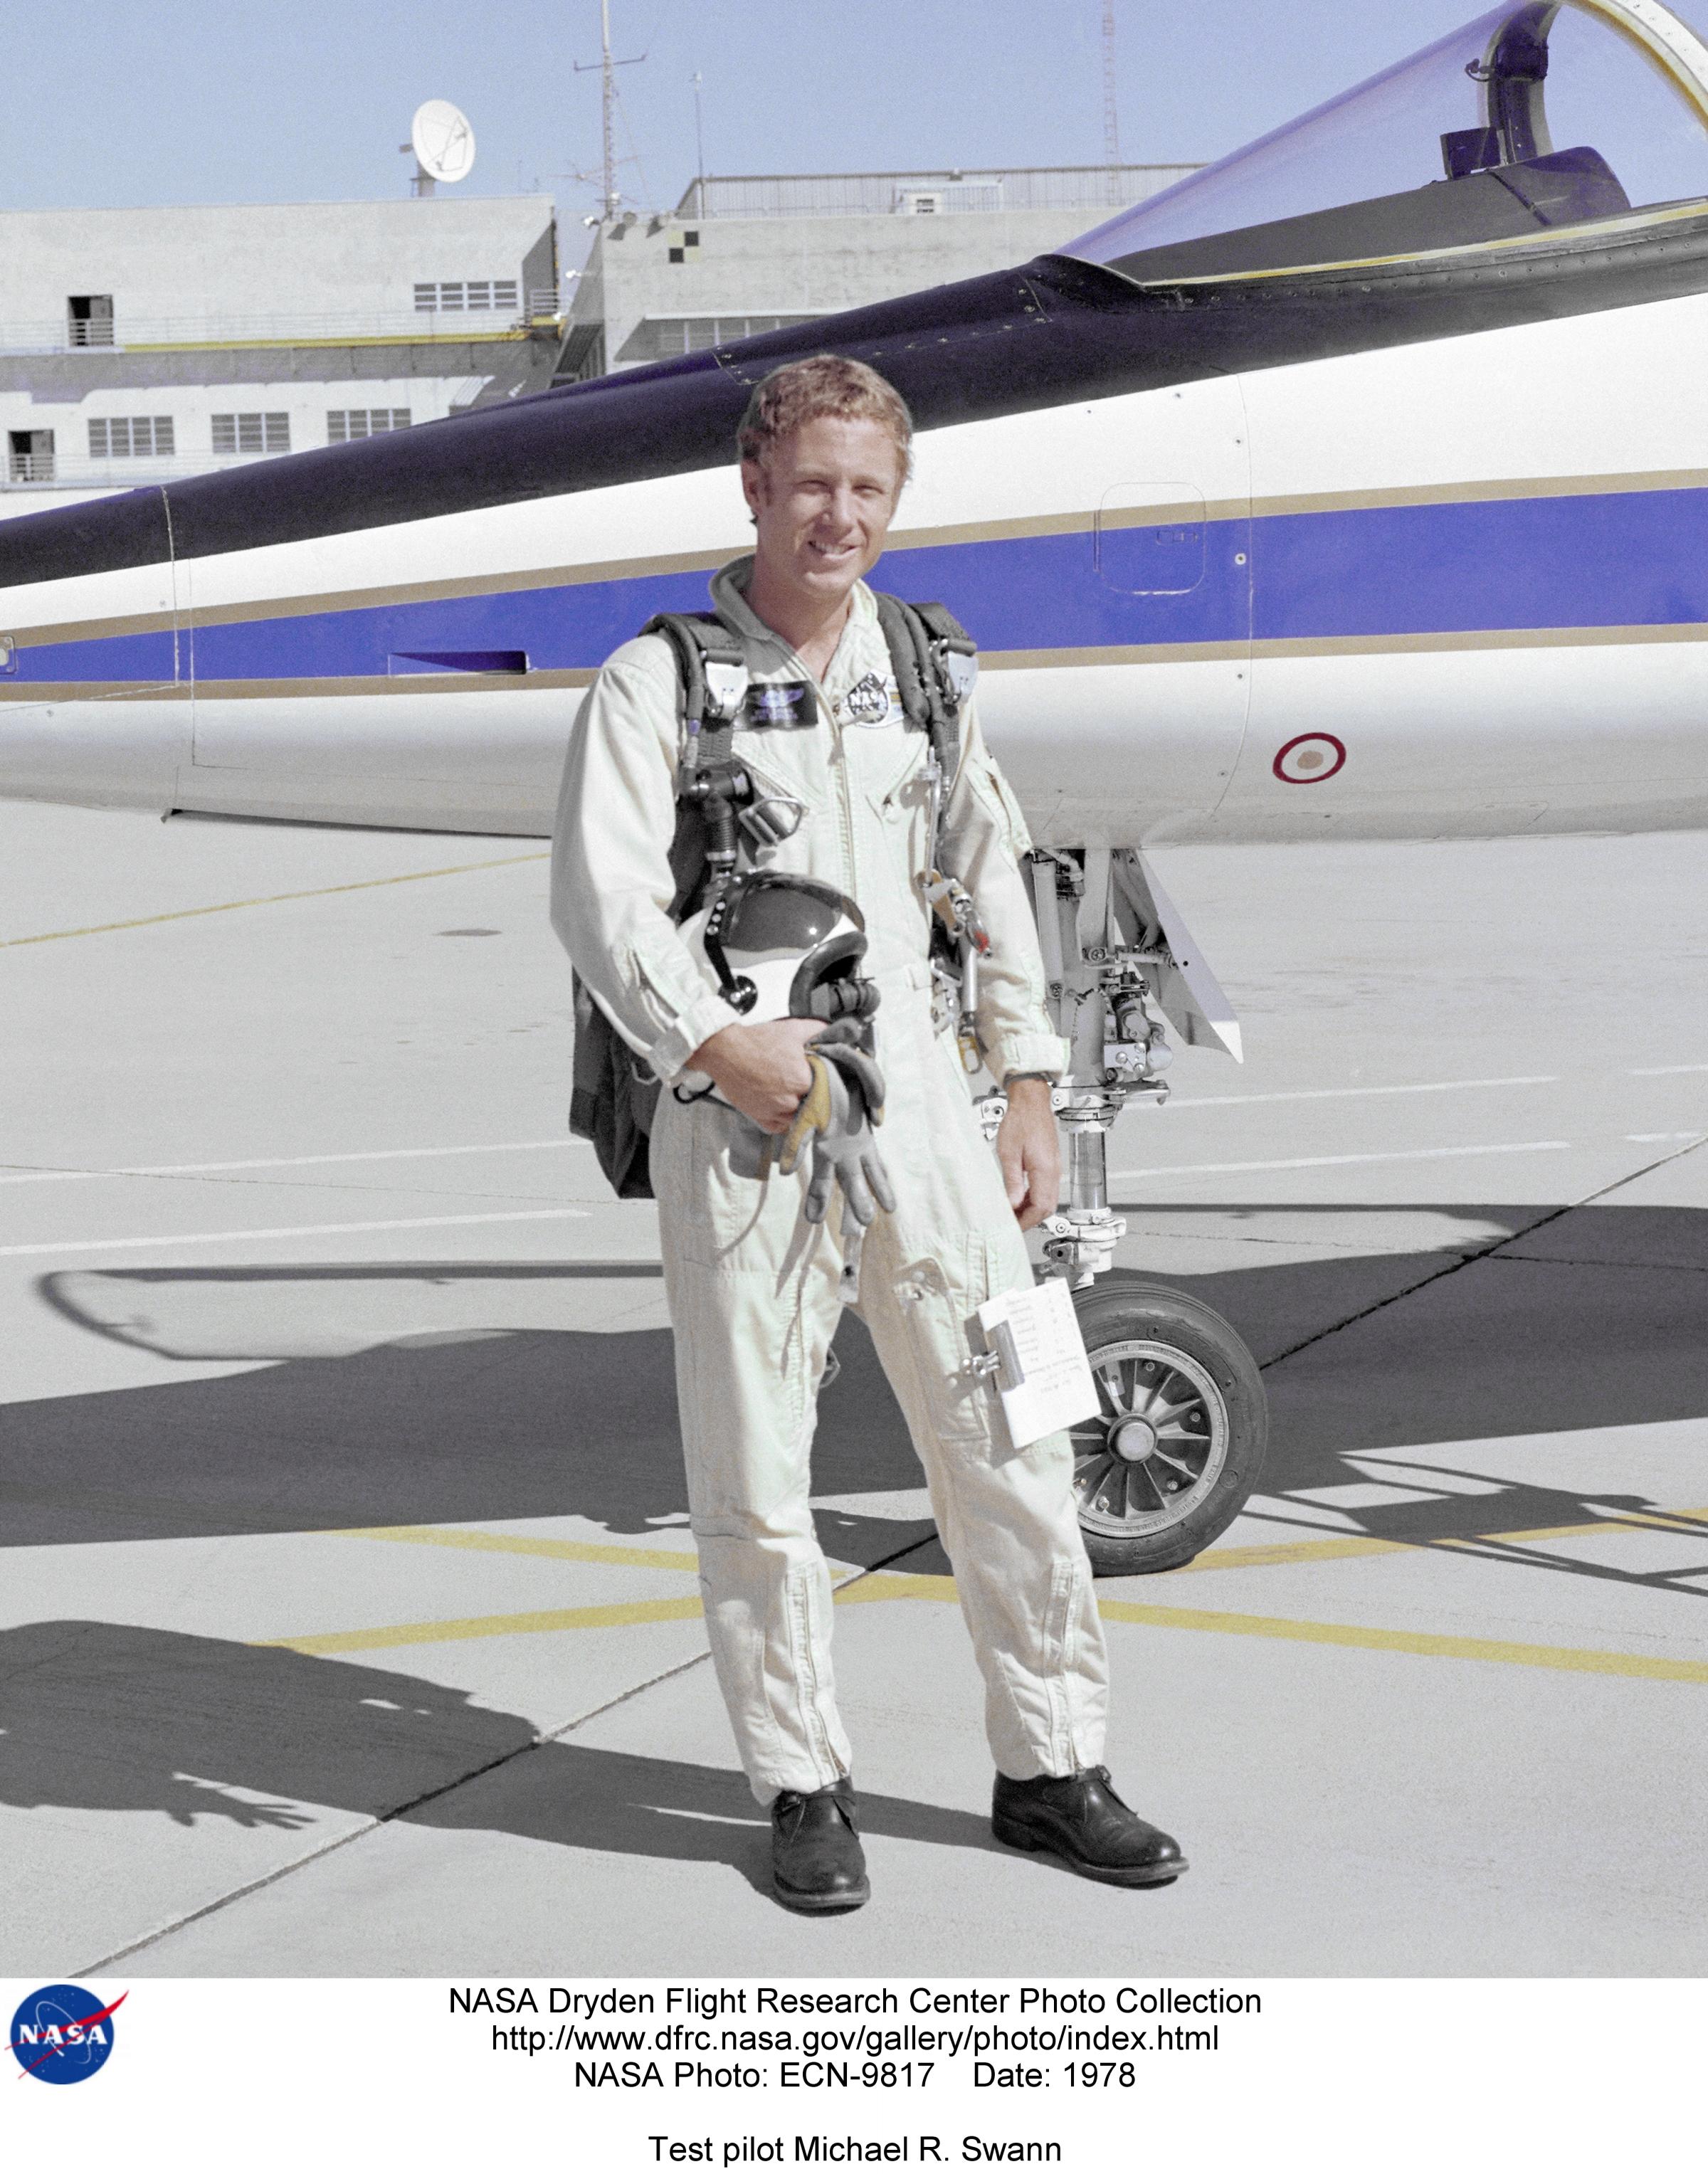 Pilots ECN-9817: Test pilot Michael R. Swann